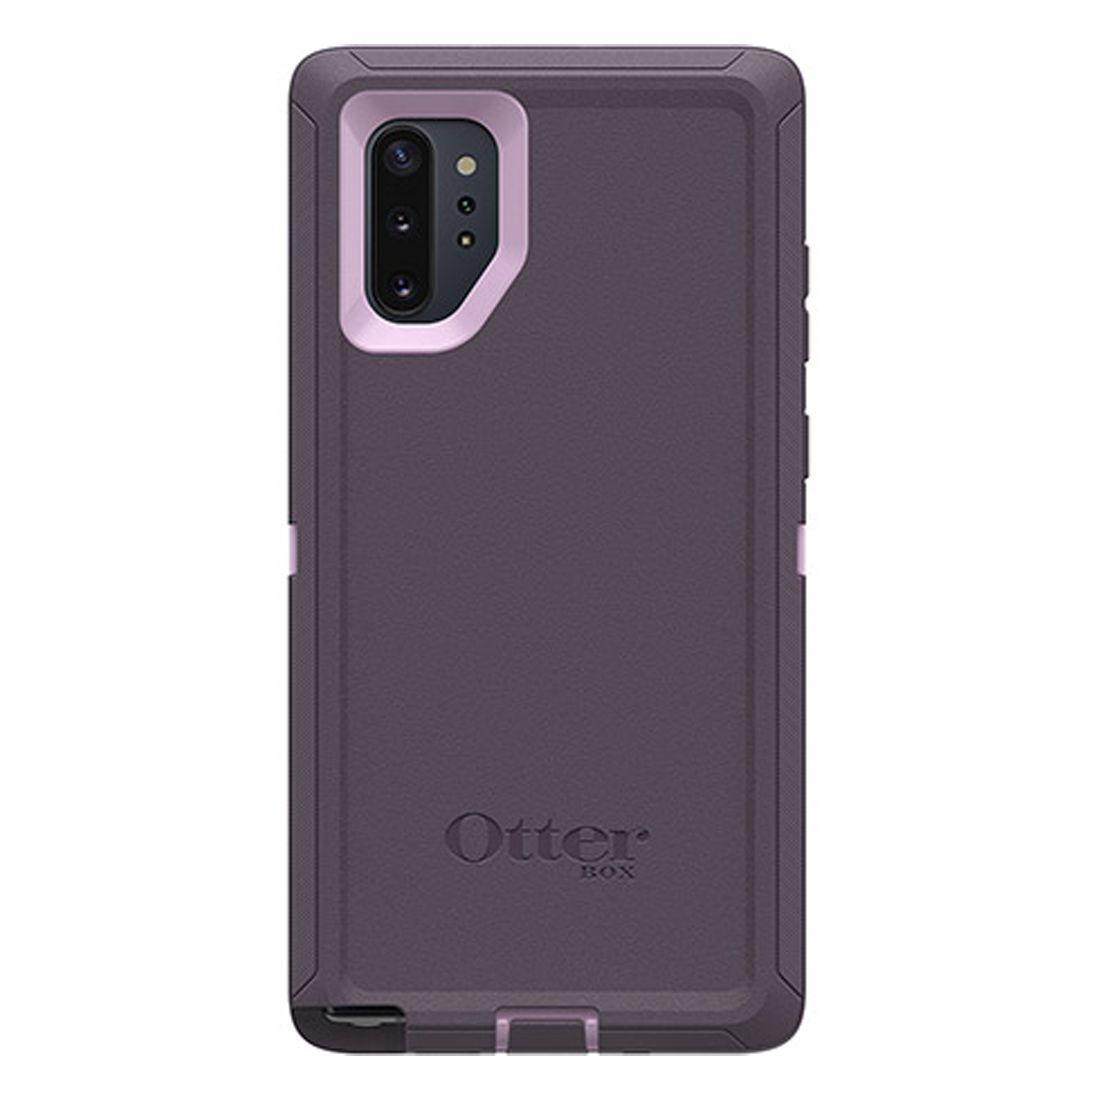 Otterbox Defender Case For Samsung Galaxy Note 10+ Plus - Purple Nebula